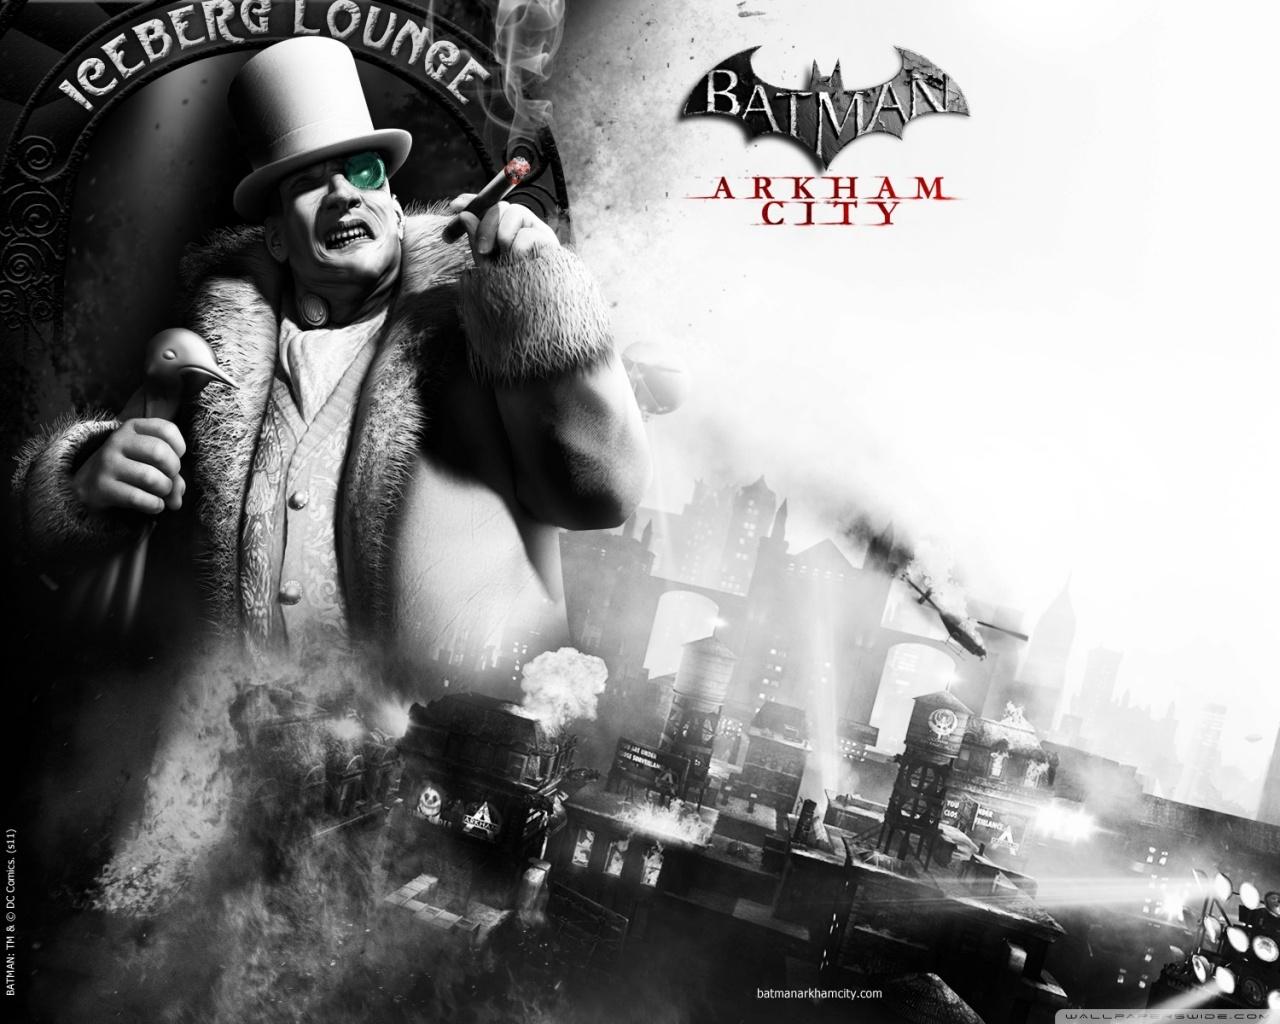 Batman Arkham City The Penguin 4K HD Desktop Wallpaper for 1280x1024